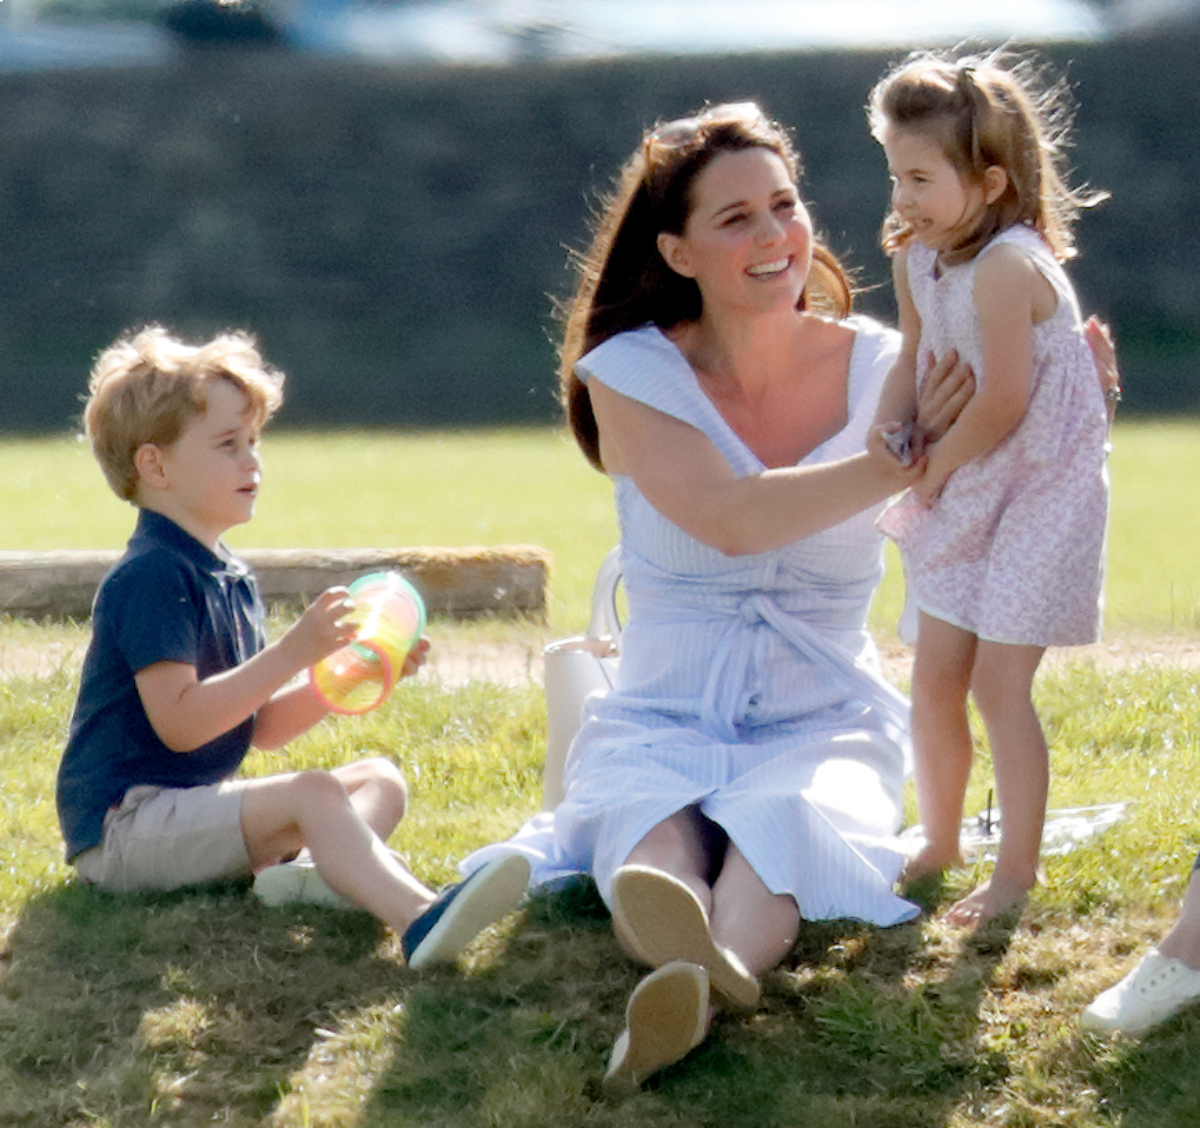 Kate Middleton's festive tartan outfit brought the Christmas joy